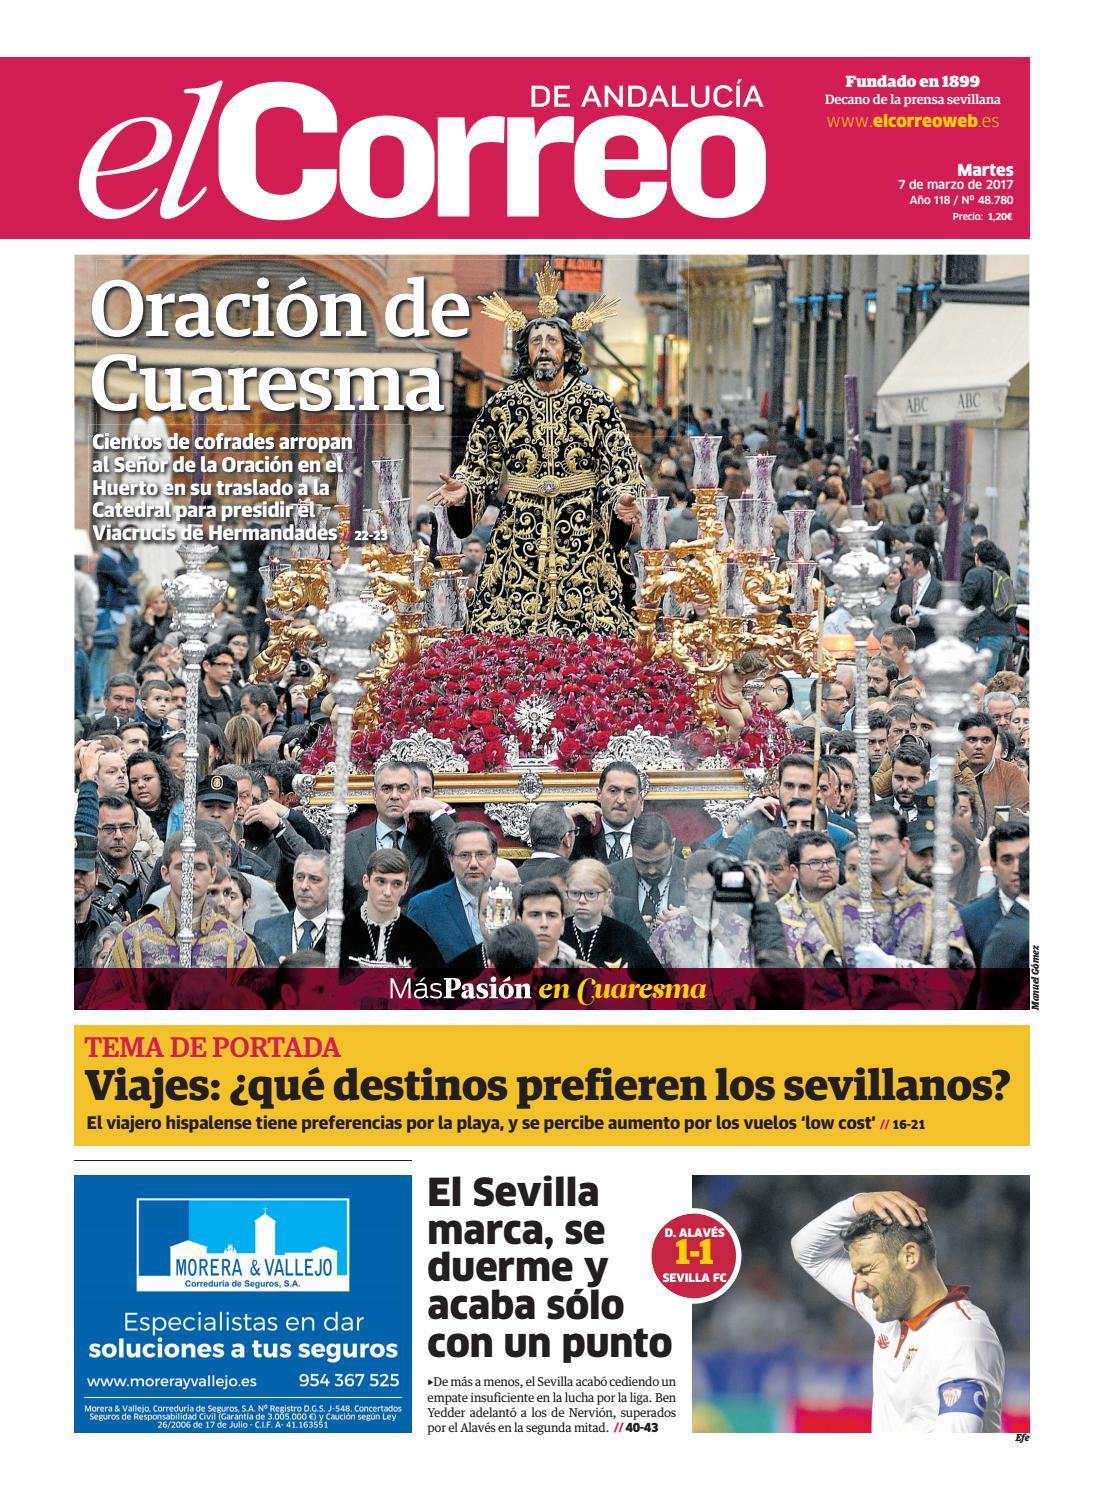 07 03 2017 El Correo de Andalucía by EL CORREO DE ANDALUCÍA S.L. - issuu 889a32f0195